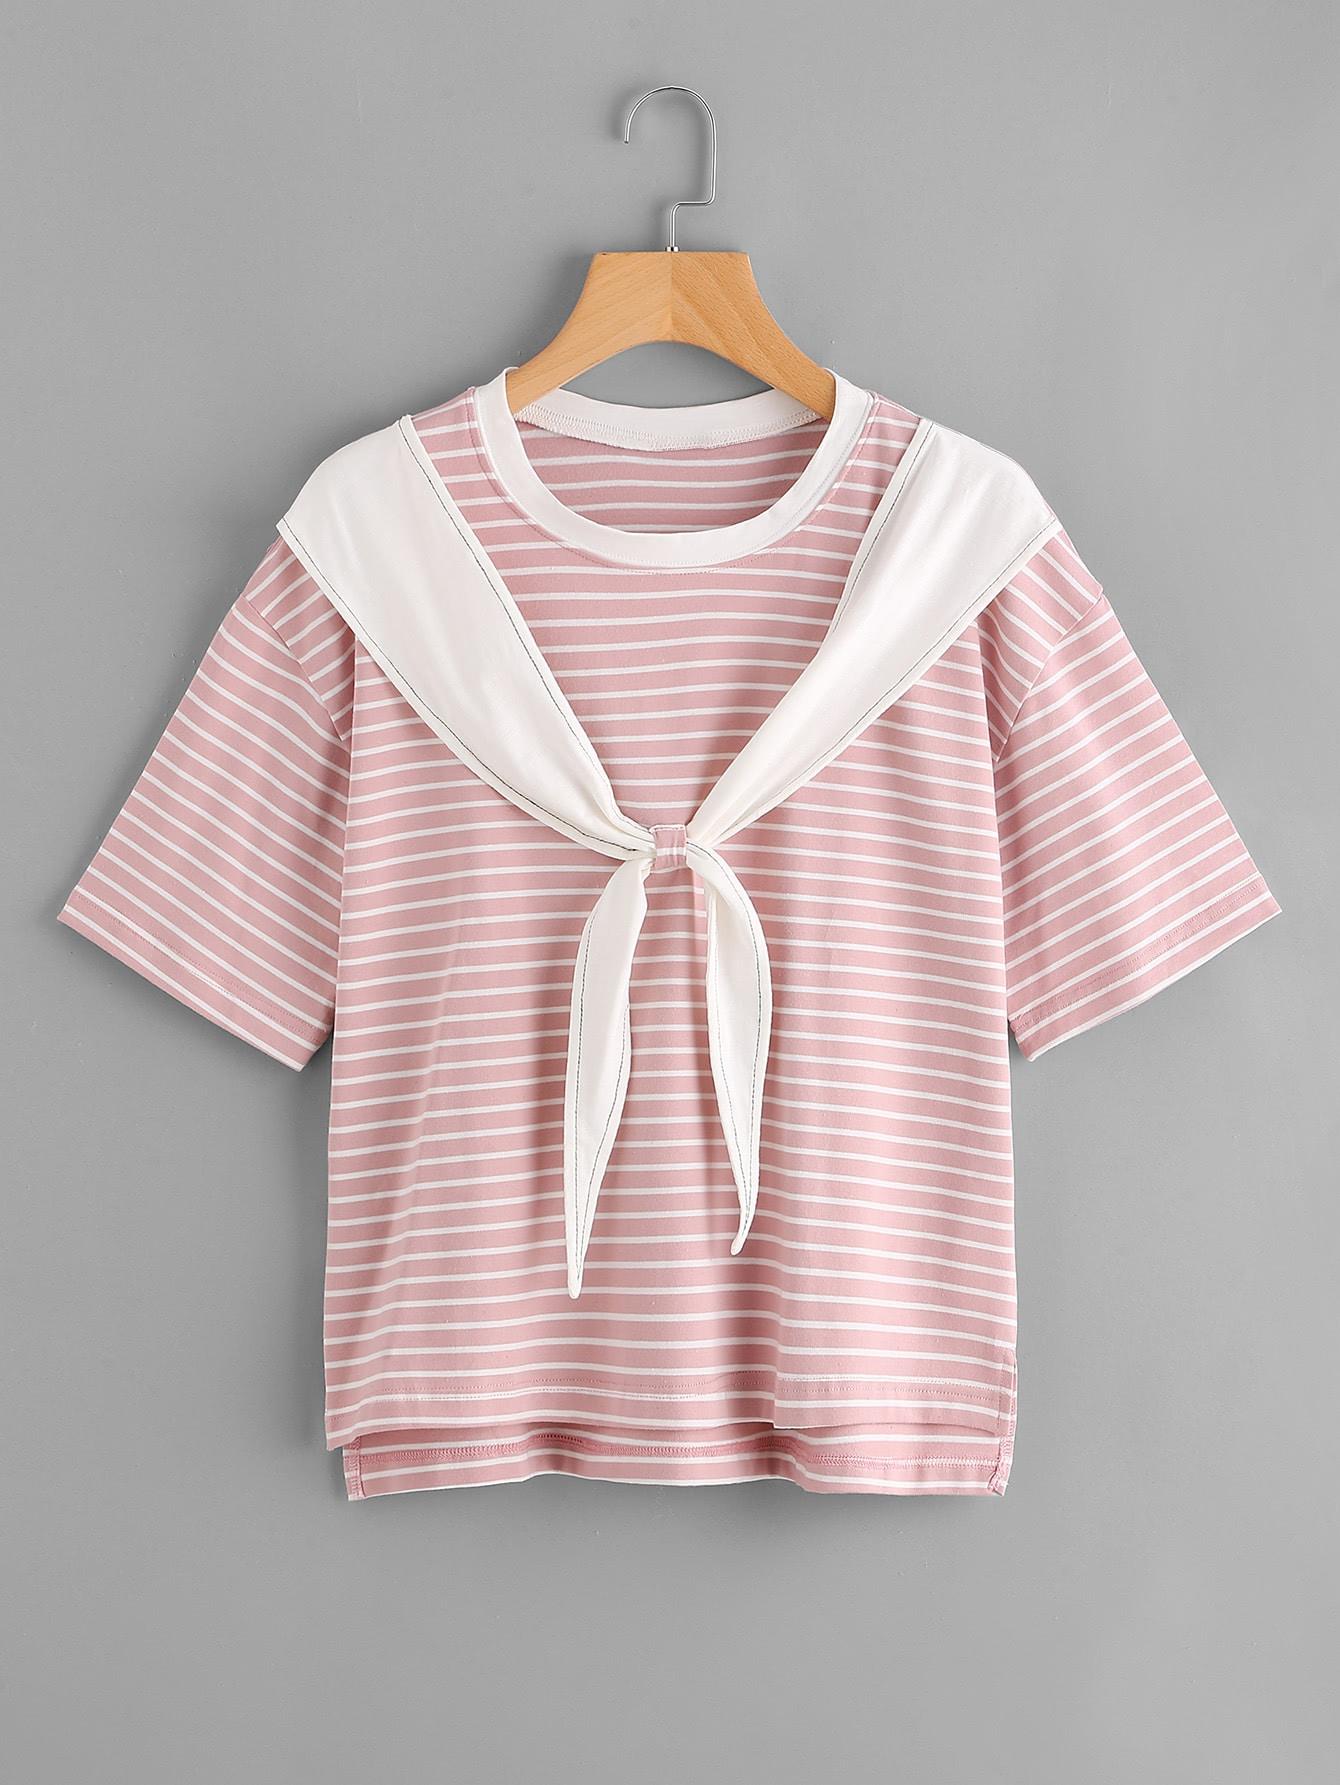 Tie Front Stepped Hem Sailor T-shirt tee170828452